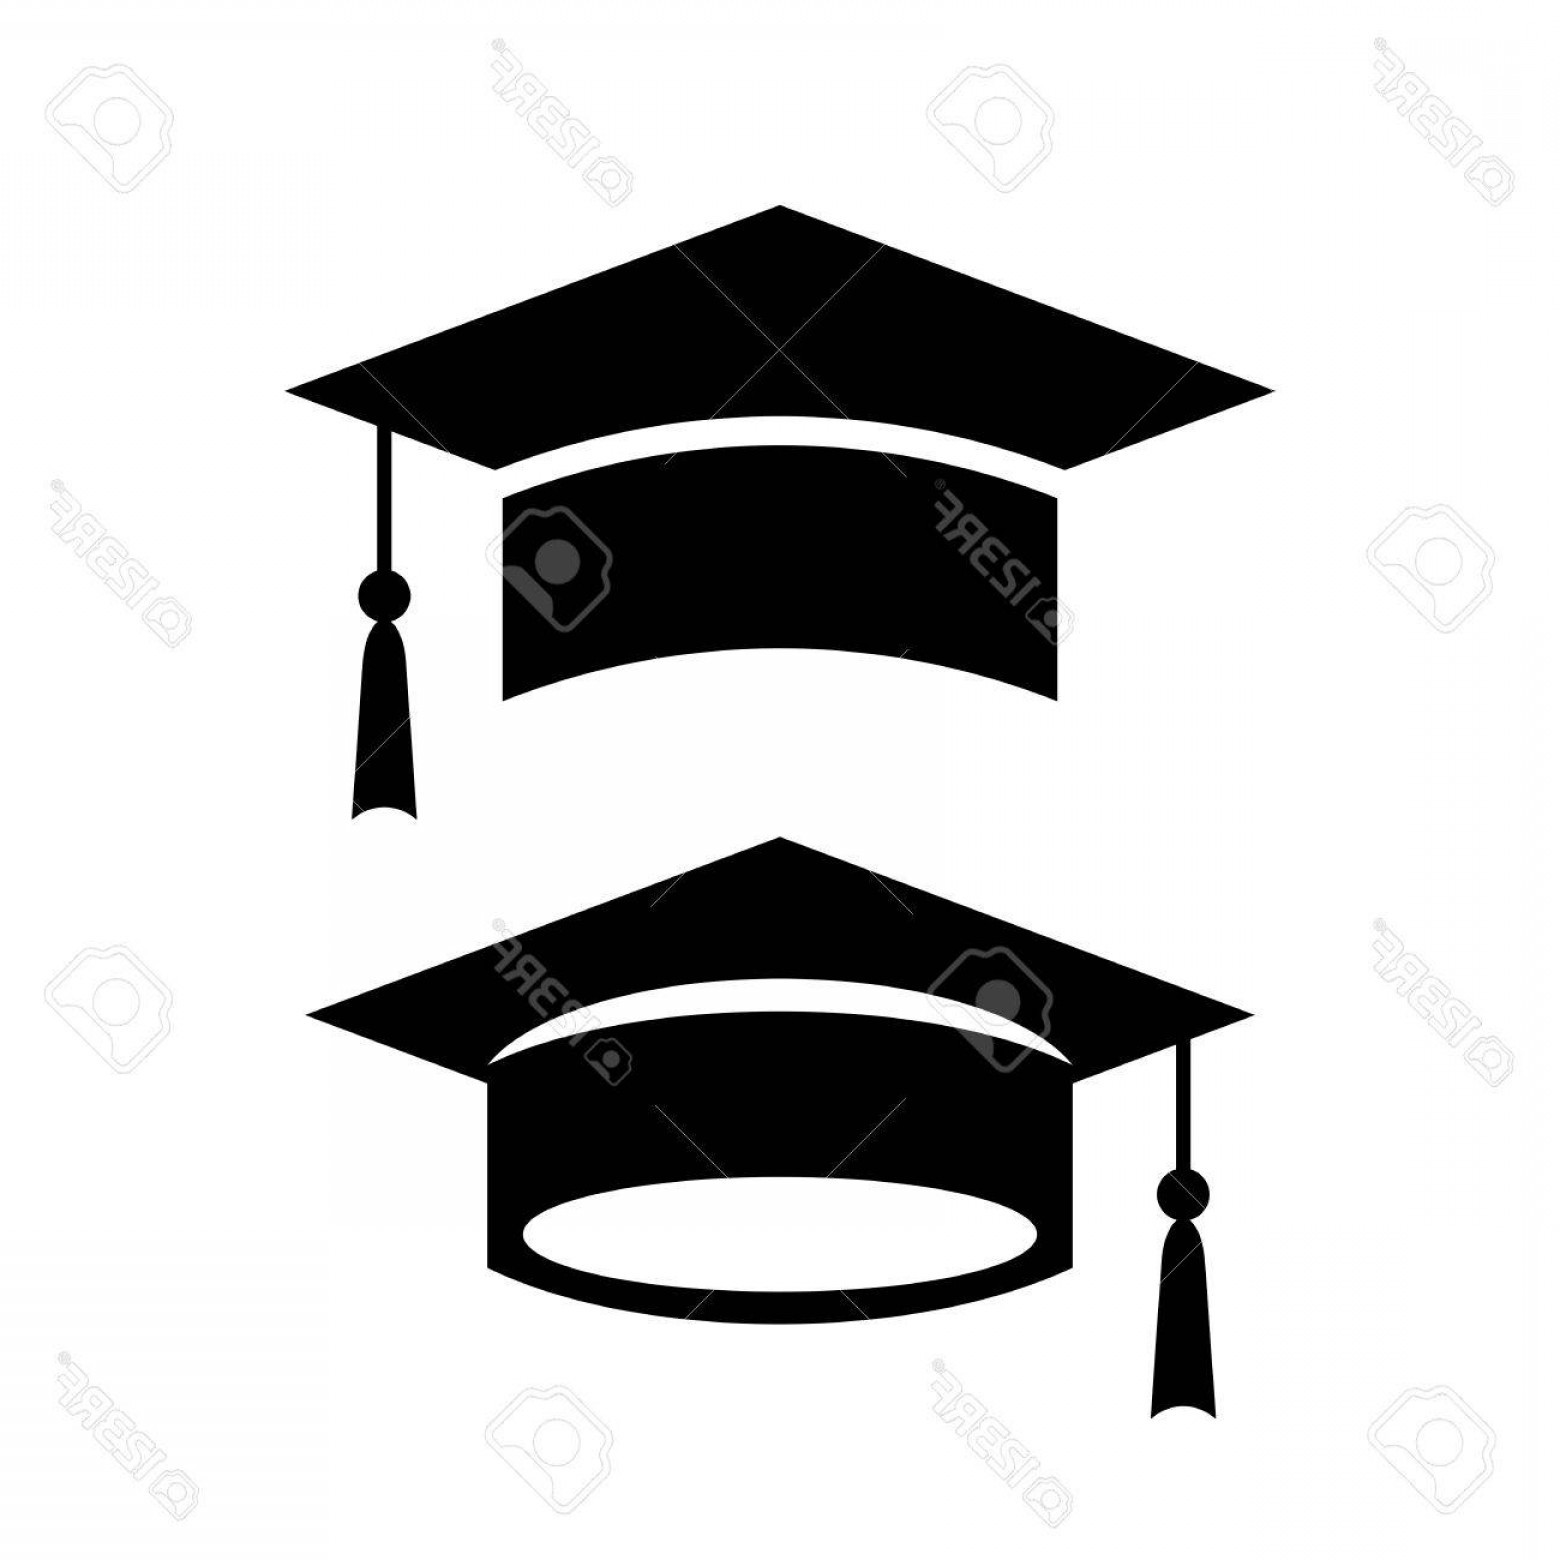 Graduation cap logo clipart clip art freeuse stock Photostock Vector Academic Graduation Cap Vector Icon | SOIDERGI clip art freeuse stock